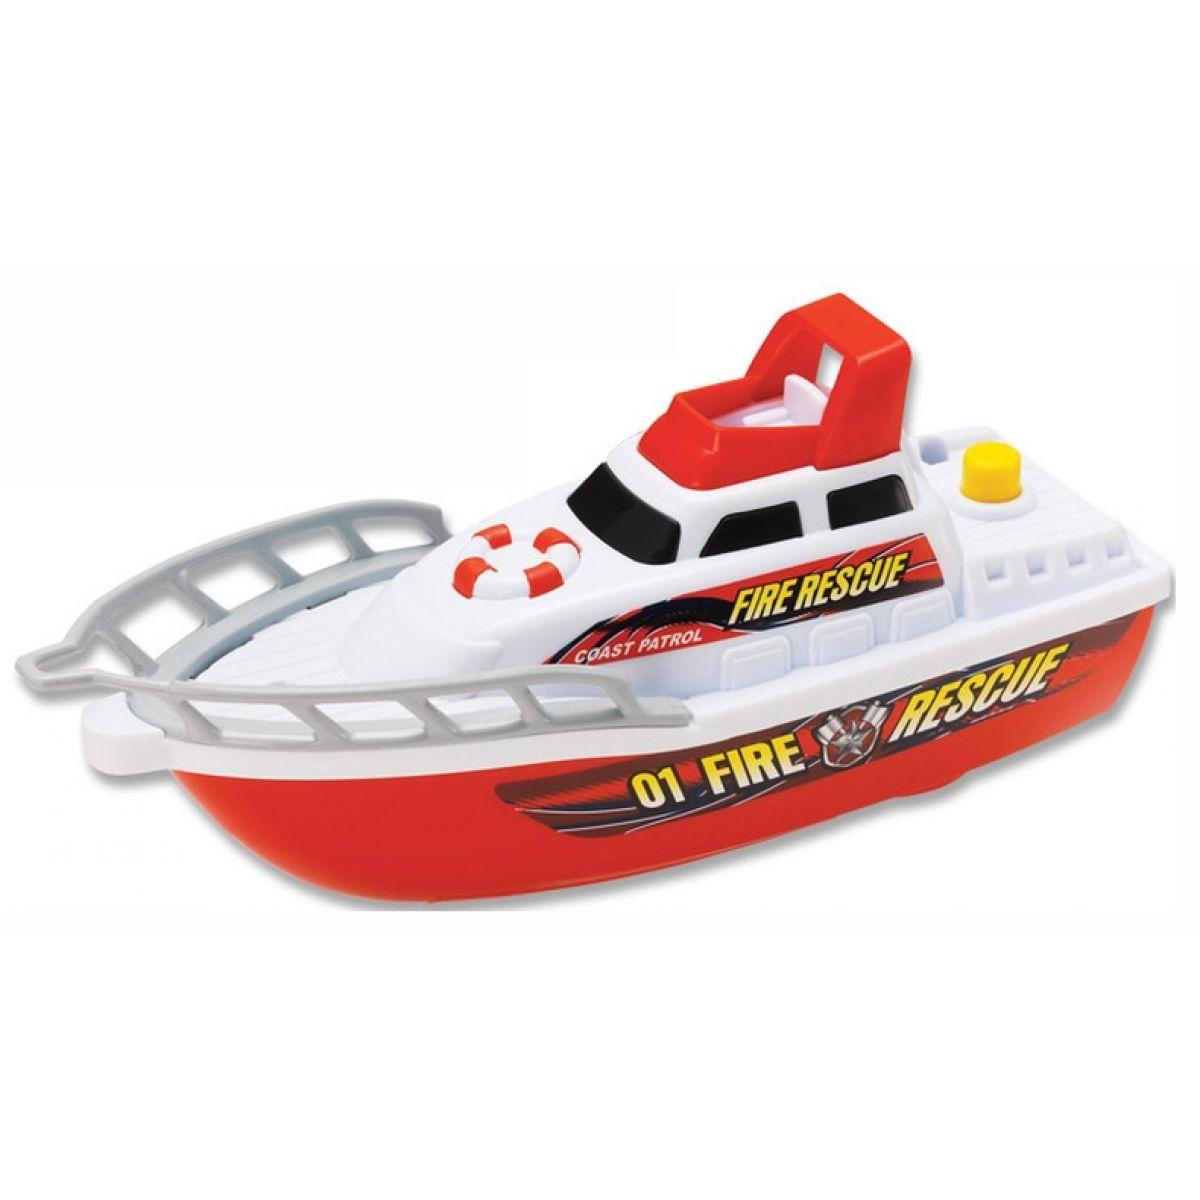 HM STUDIO 2813901-3 - Motorové čluny, 2AA baterie - hasiči - Modrá